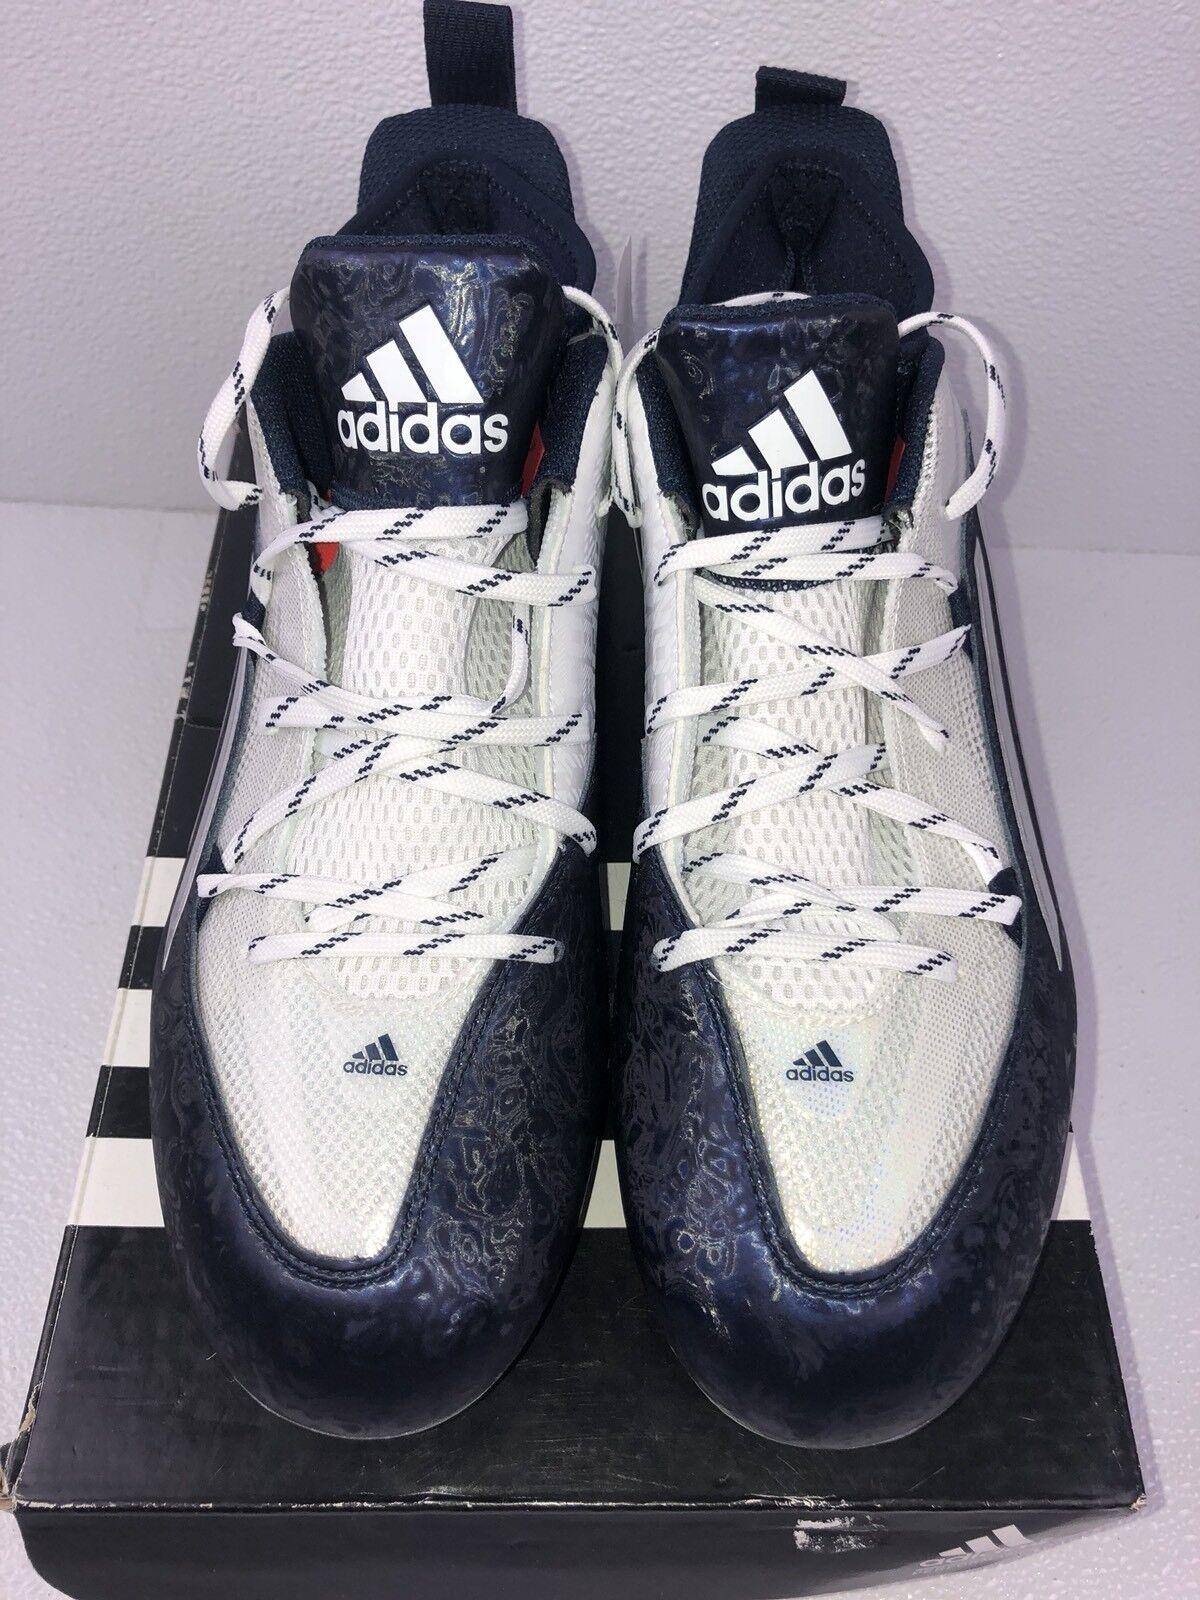 Chaussures de football NIB Adidas Crazyquick 2.0, blanc / bleu marine, taille 11,5